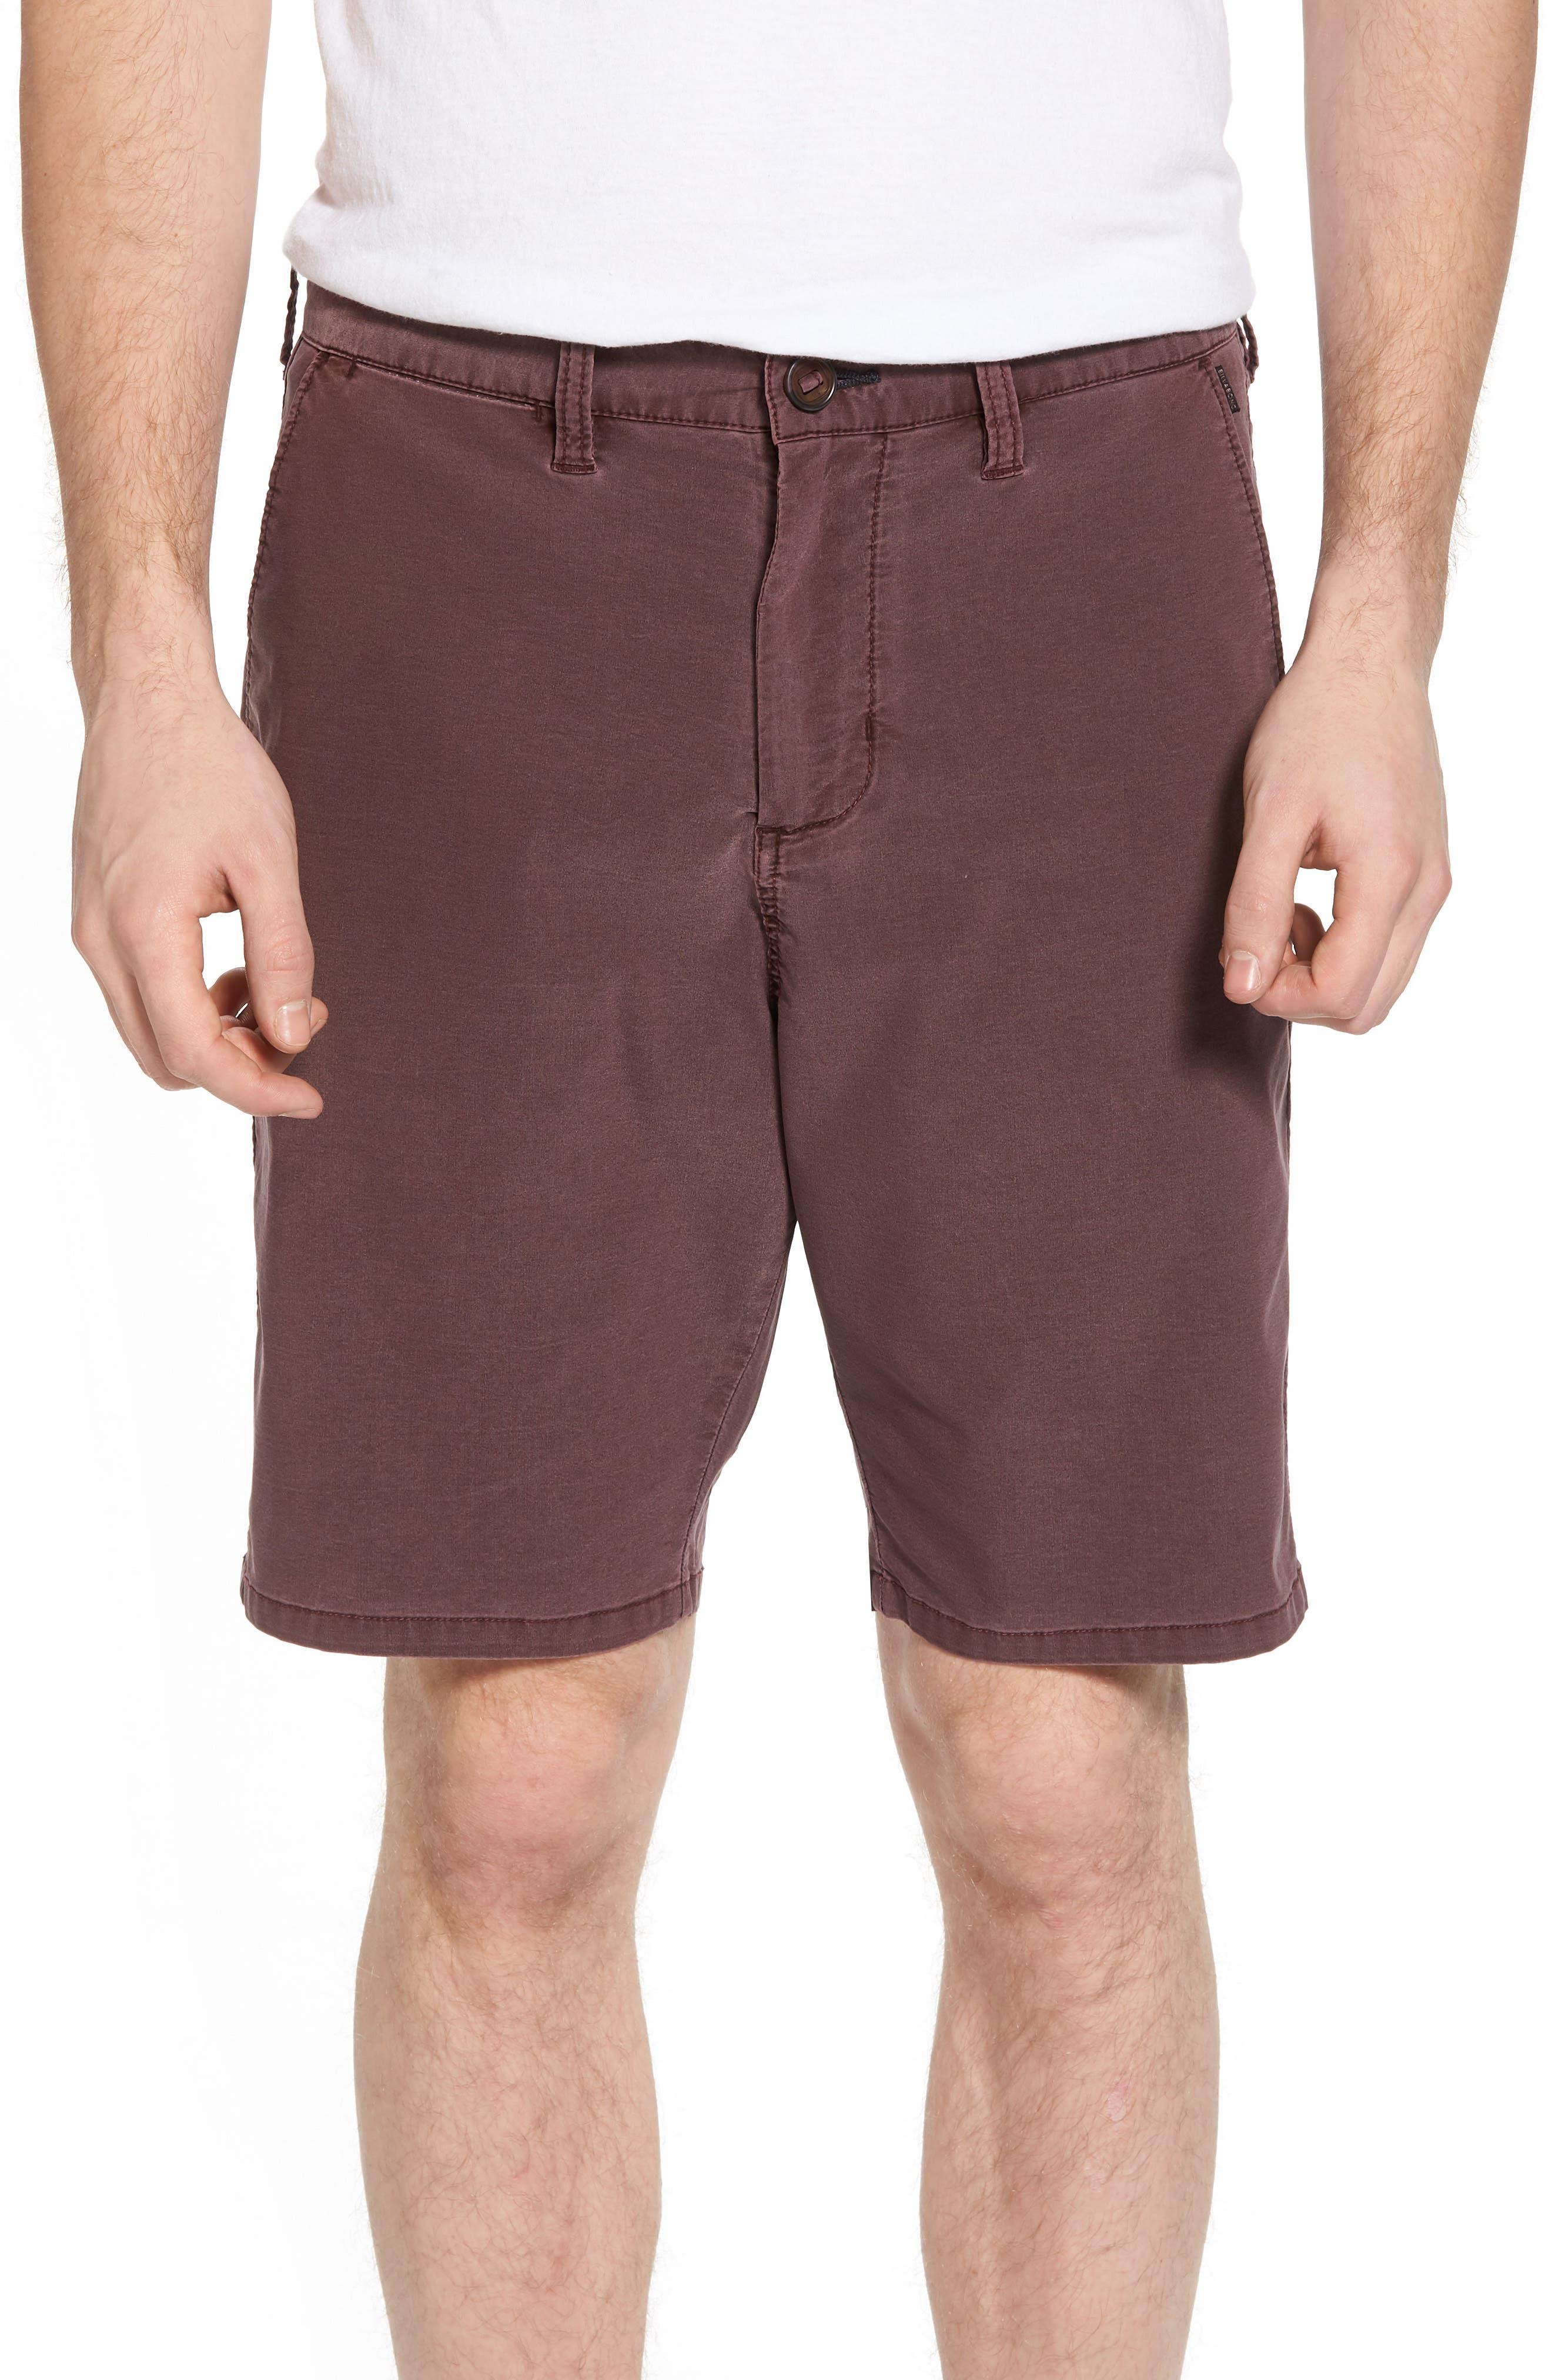 New Order X Overdye Hybrid Shorts,                         Main,                         color, Rum